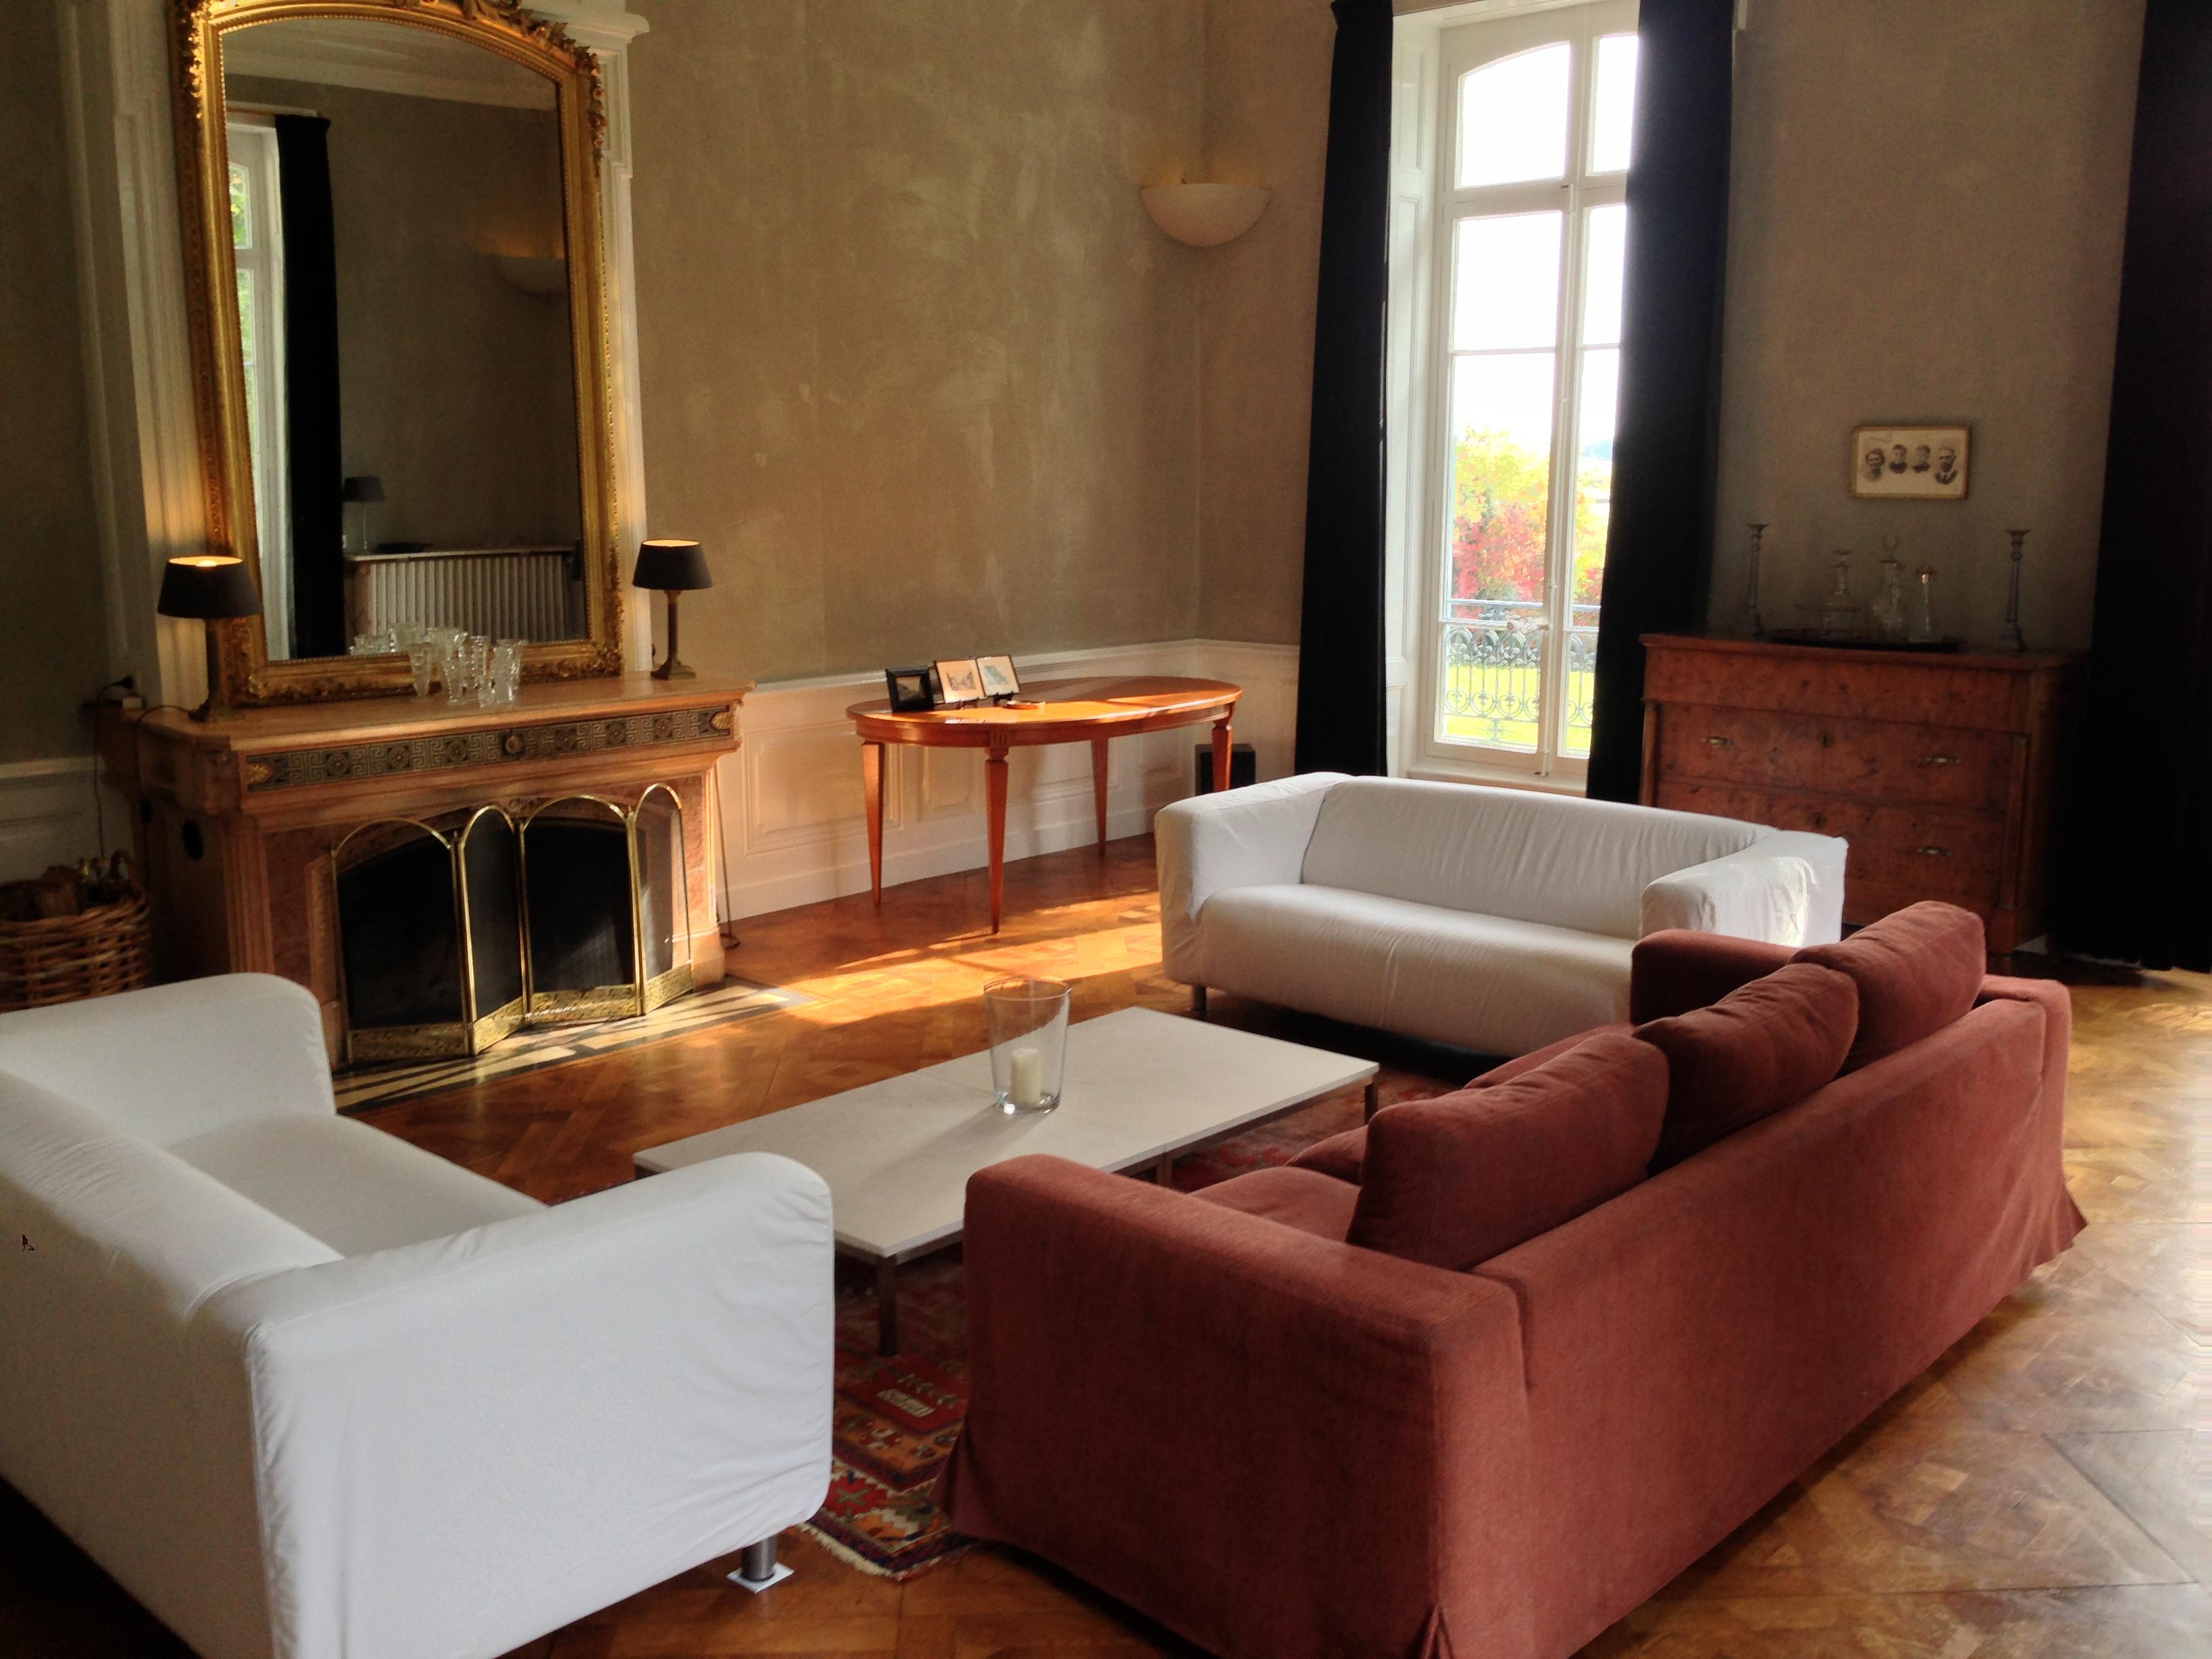 Sittingroom Chateau Les Bardons met oude spiege;